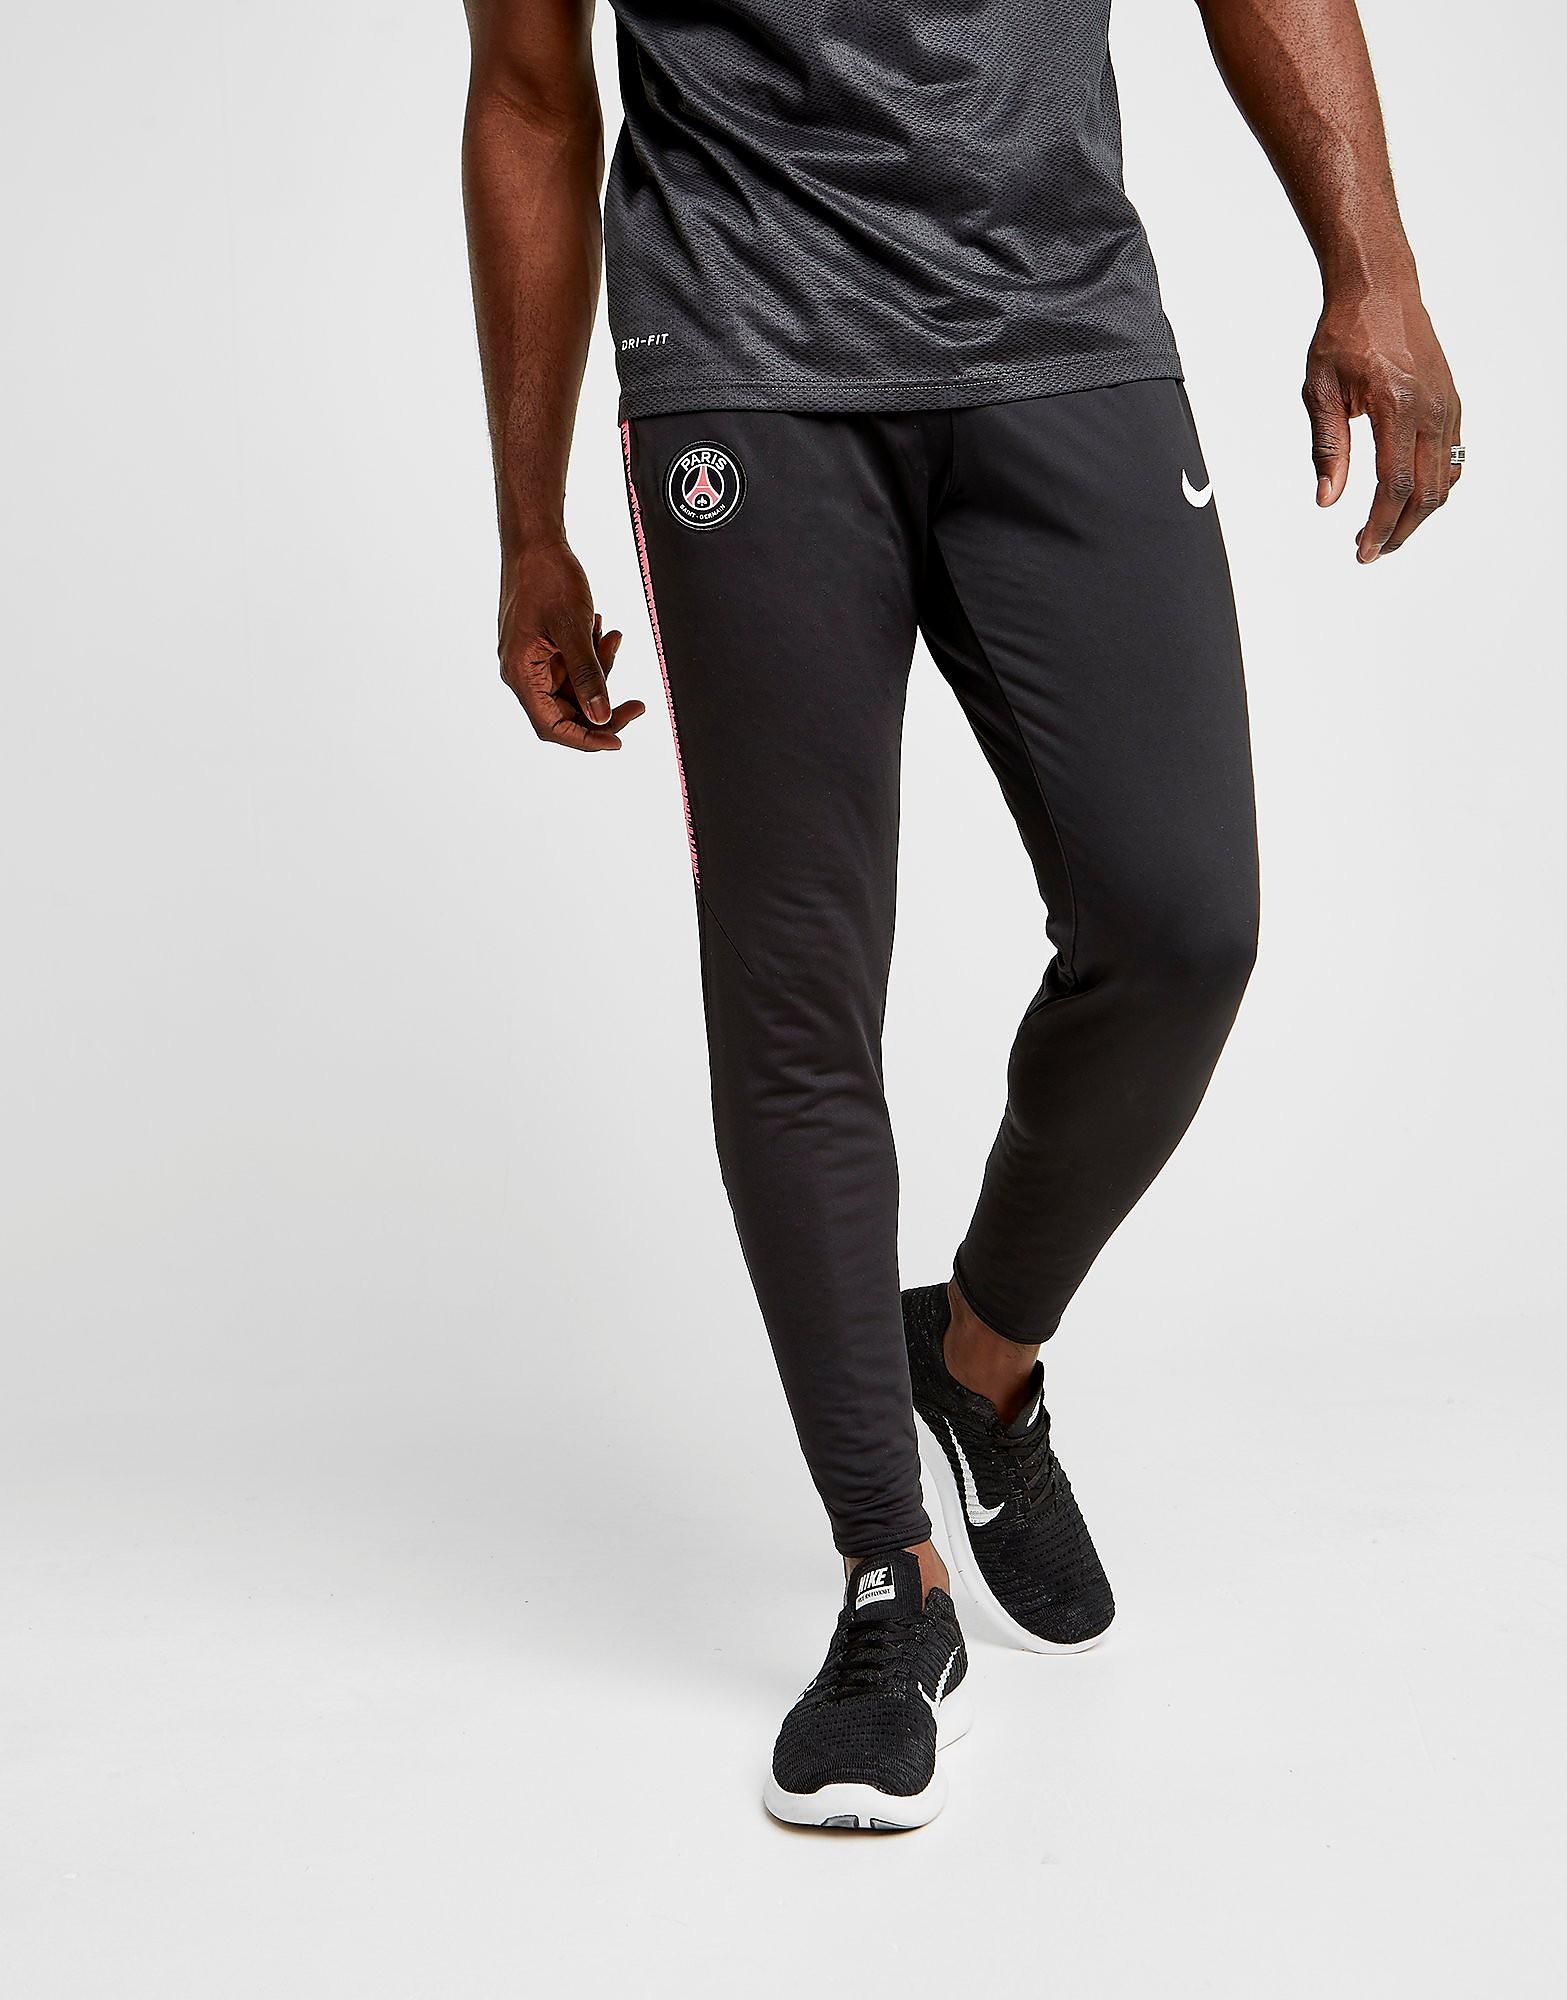 Nike Paris Saint Germain 2018/19 Squad Pants